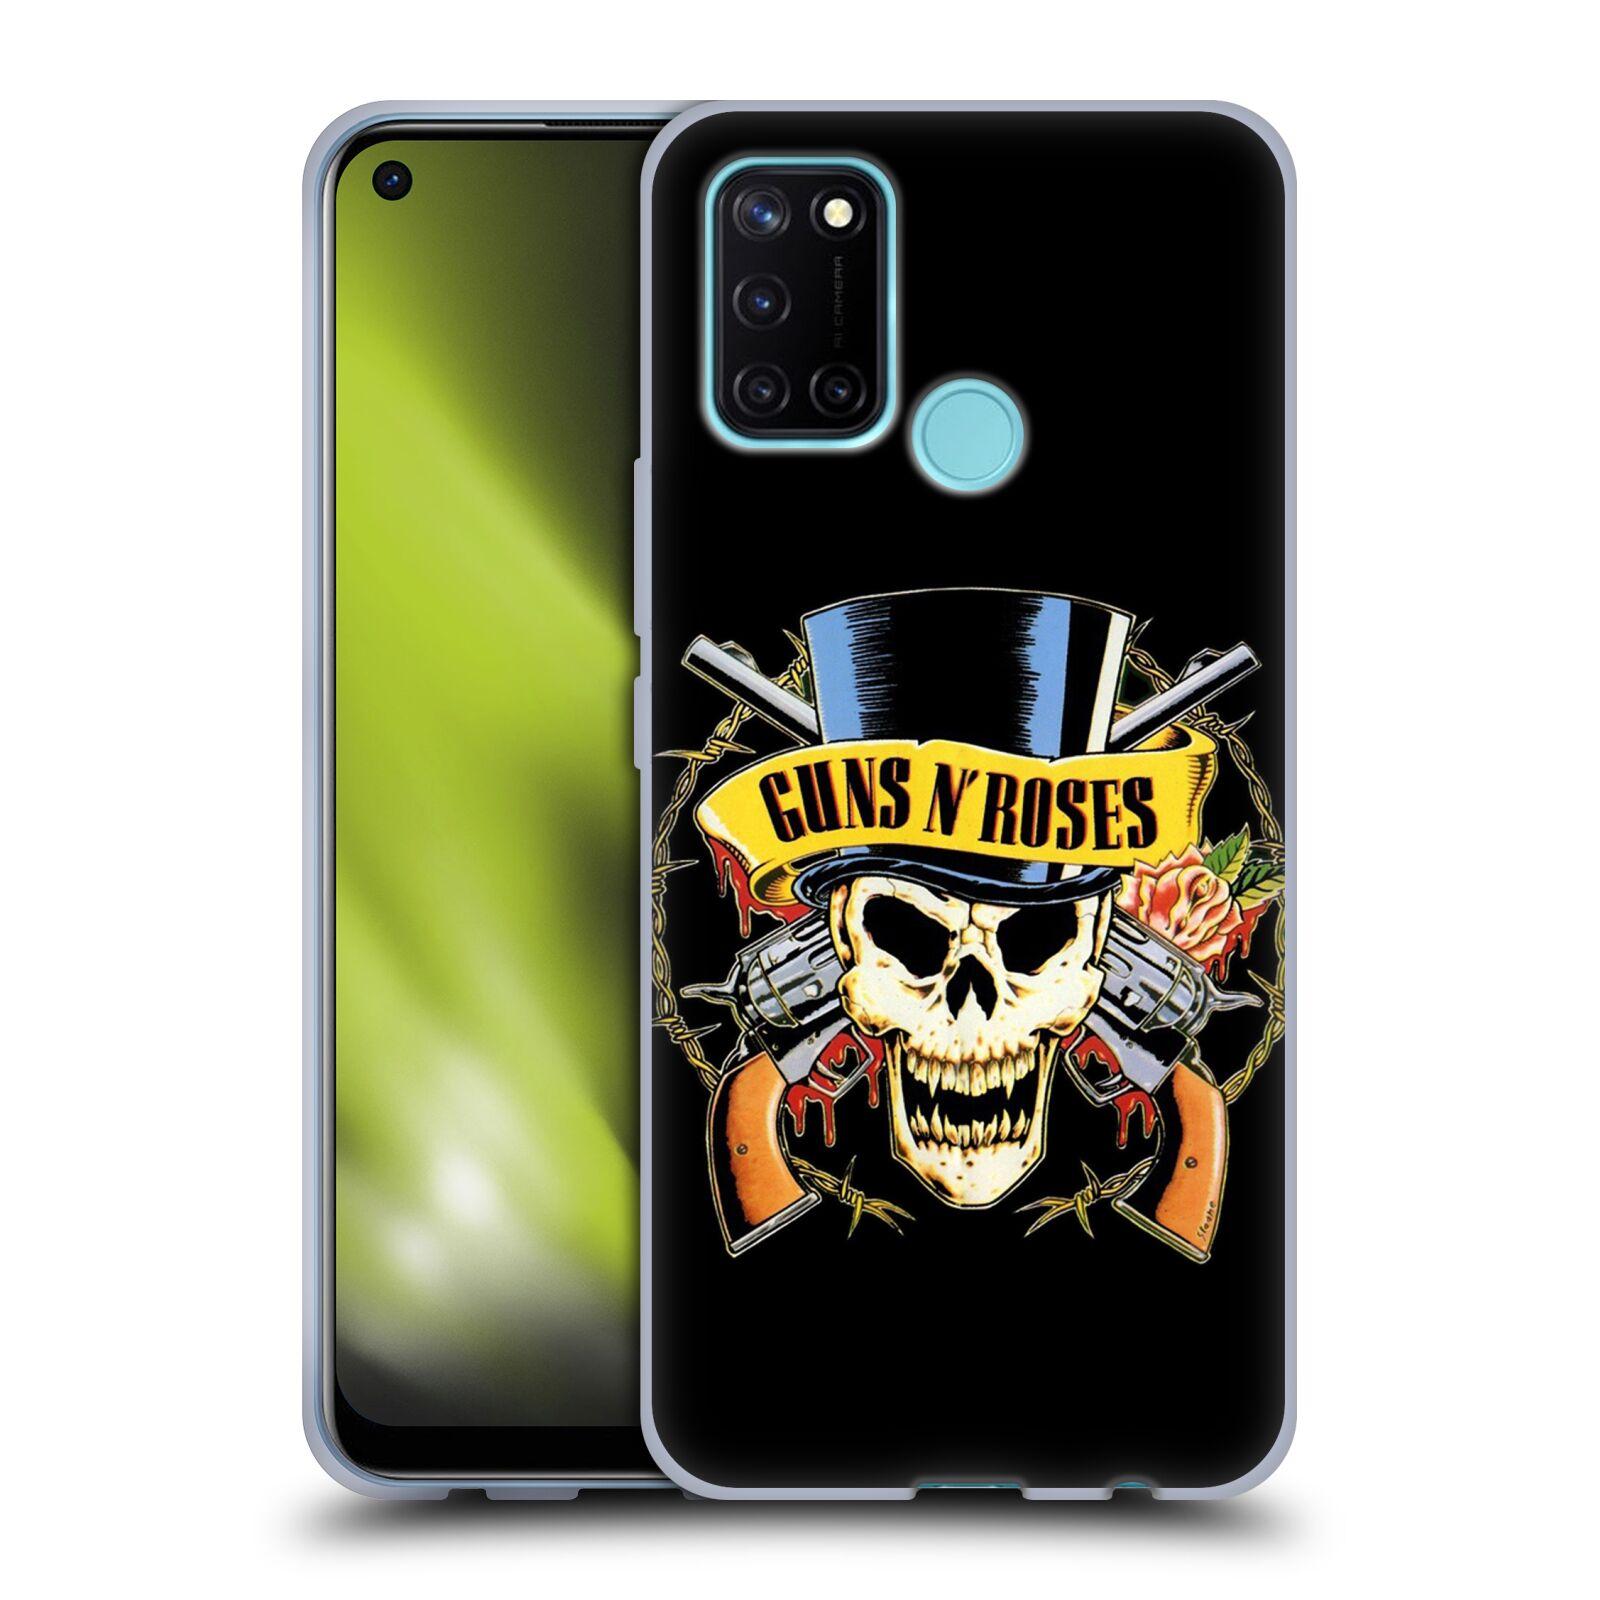 Silikonové pouzdro na mobil Realme 7i - Head Case - Guns N' Roses - Lebka